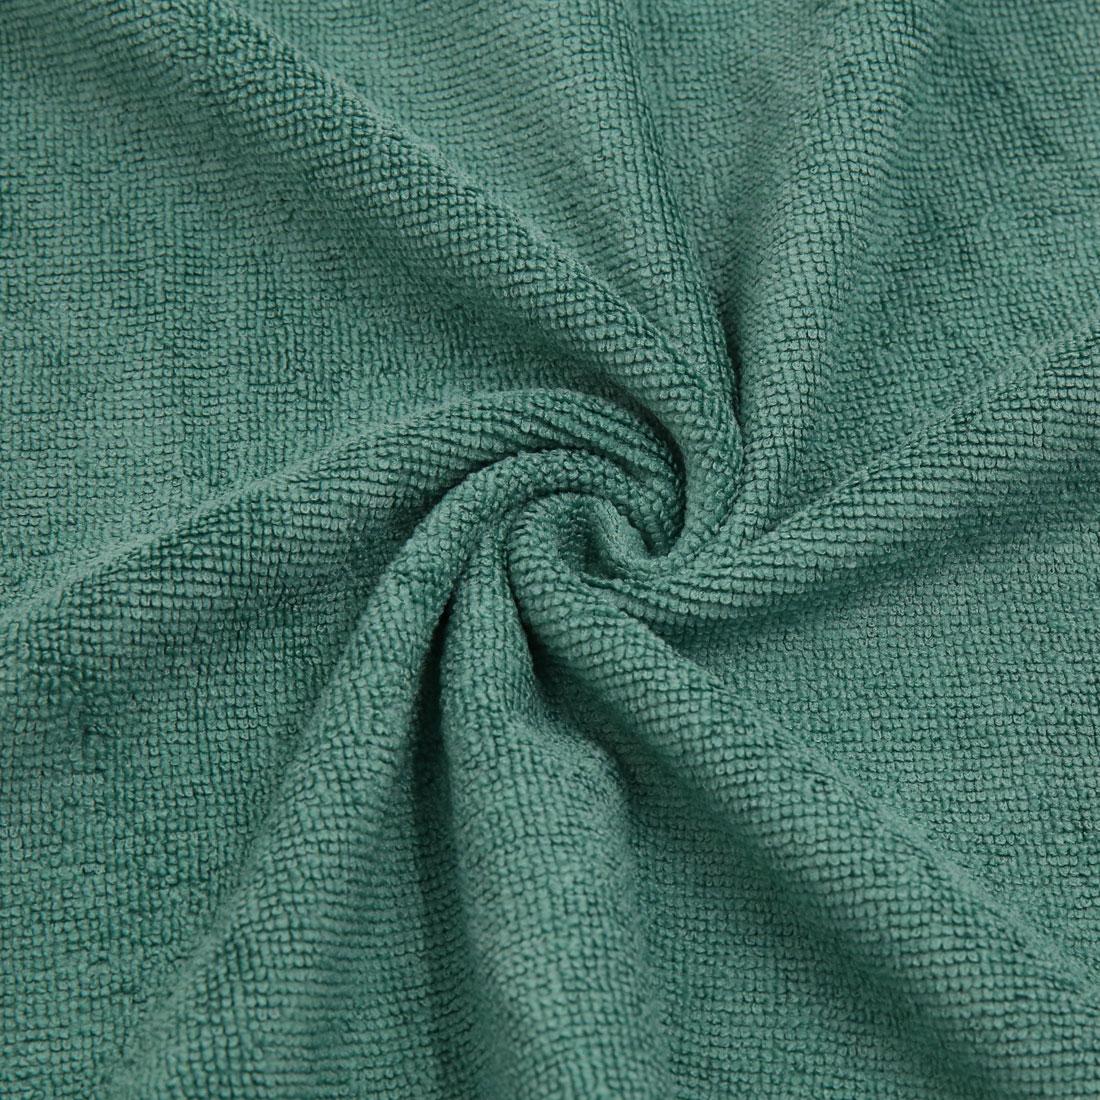 Auto Washing Towels 3pcs 300gsm 65 x 33cm Dark Light Blue Coffee Color Water Absorb Car Clean Towel - image 3 de 7